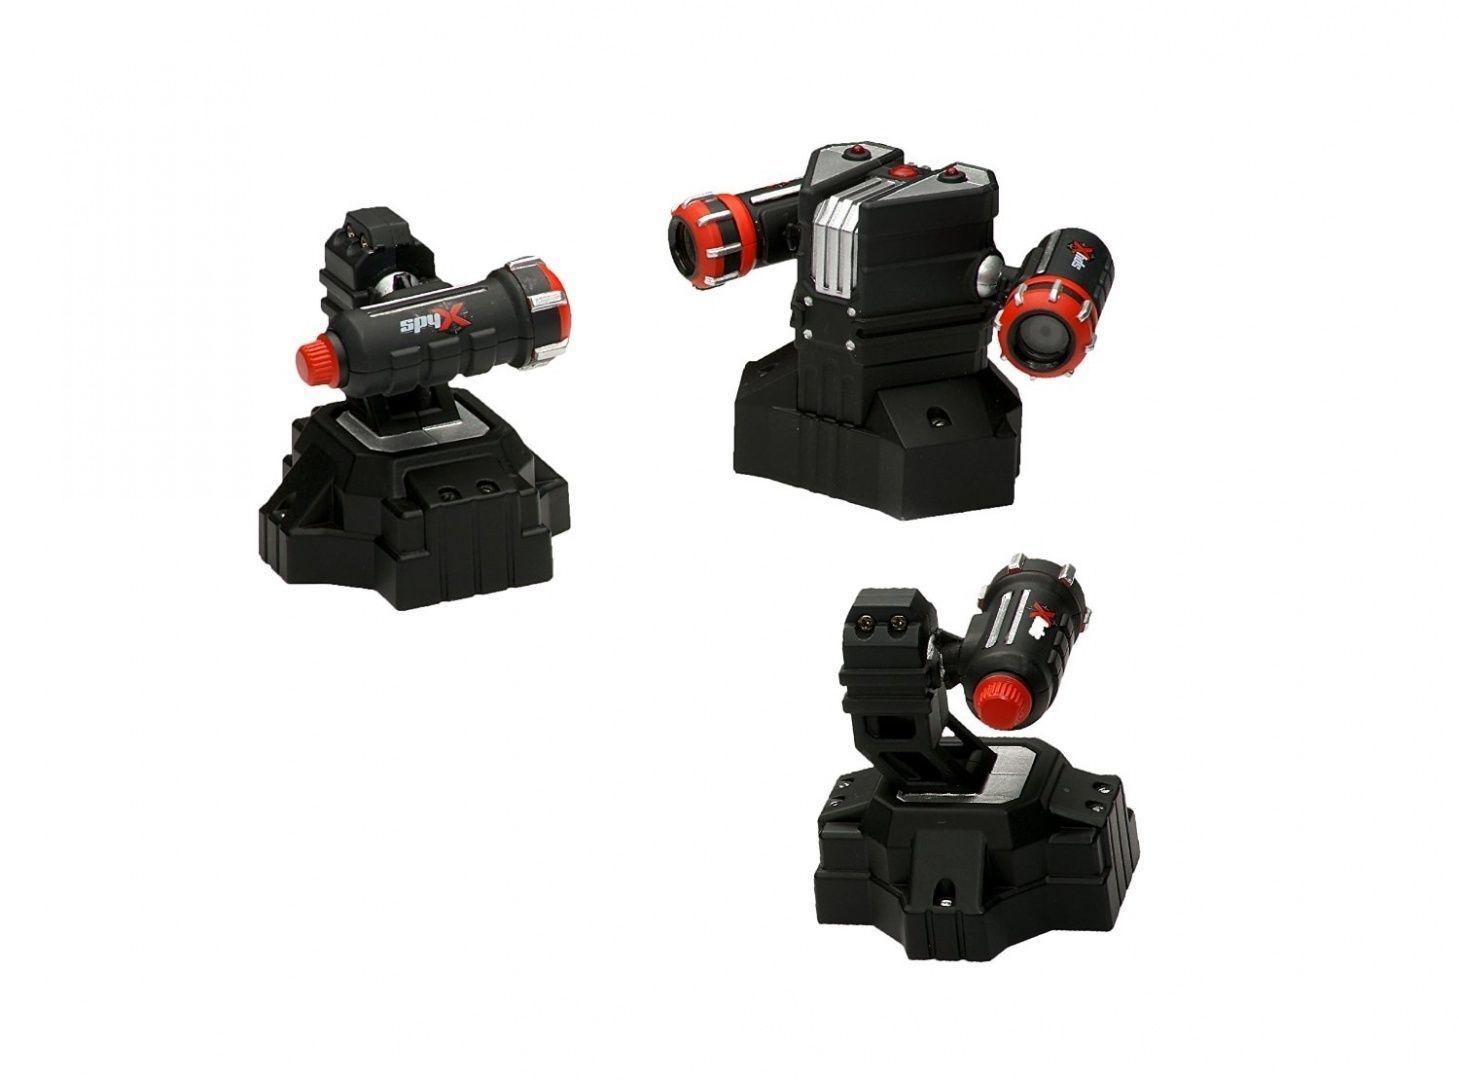 SpyX Lazer Trap Alarm (29910278)